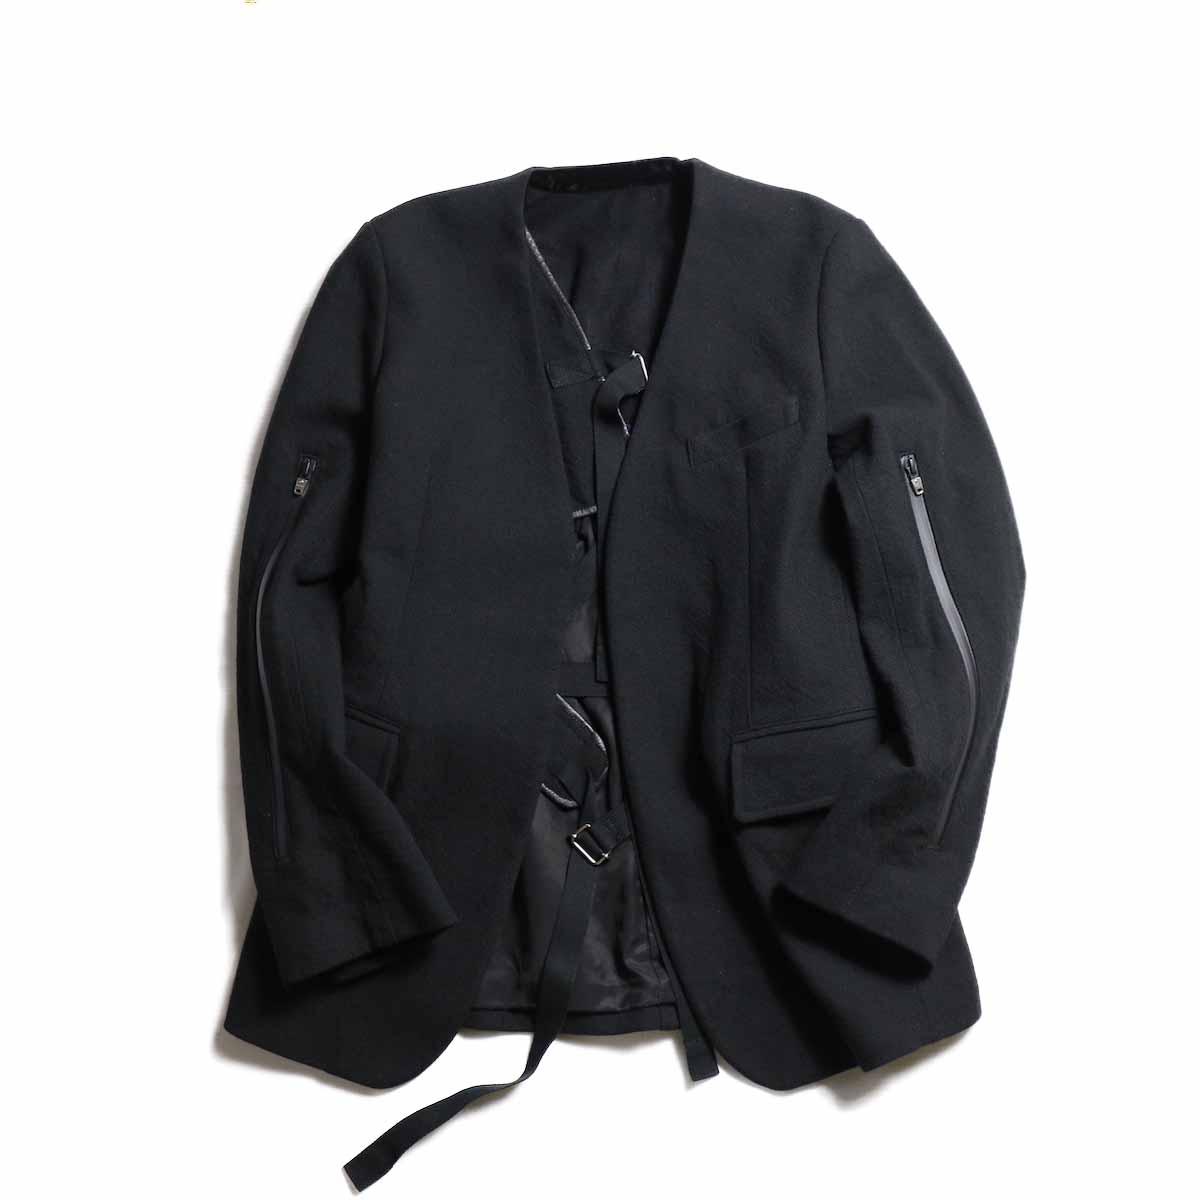 TheSoloist / sj.0003aAW18 collarless jacket.